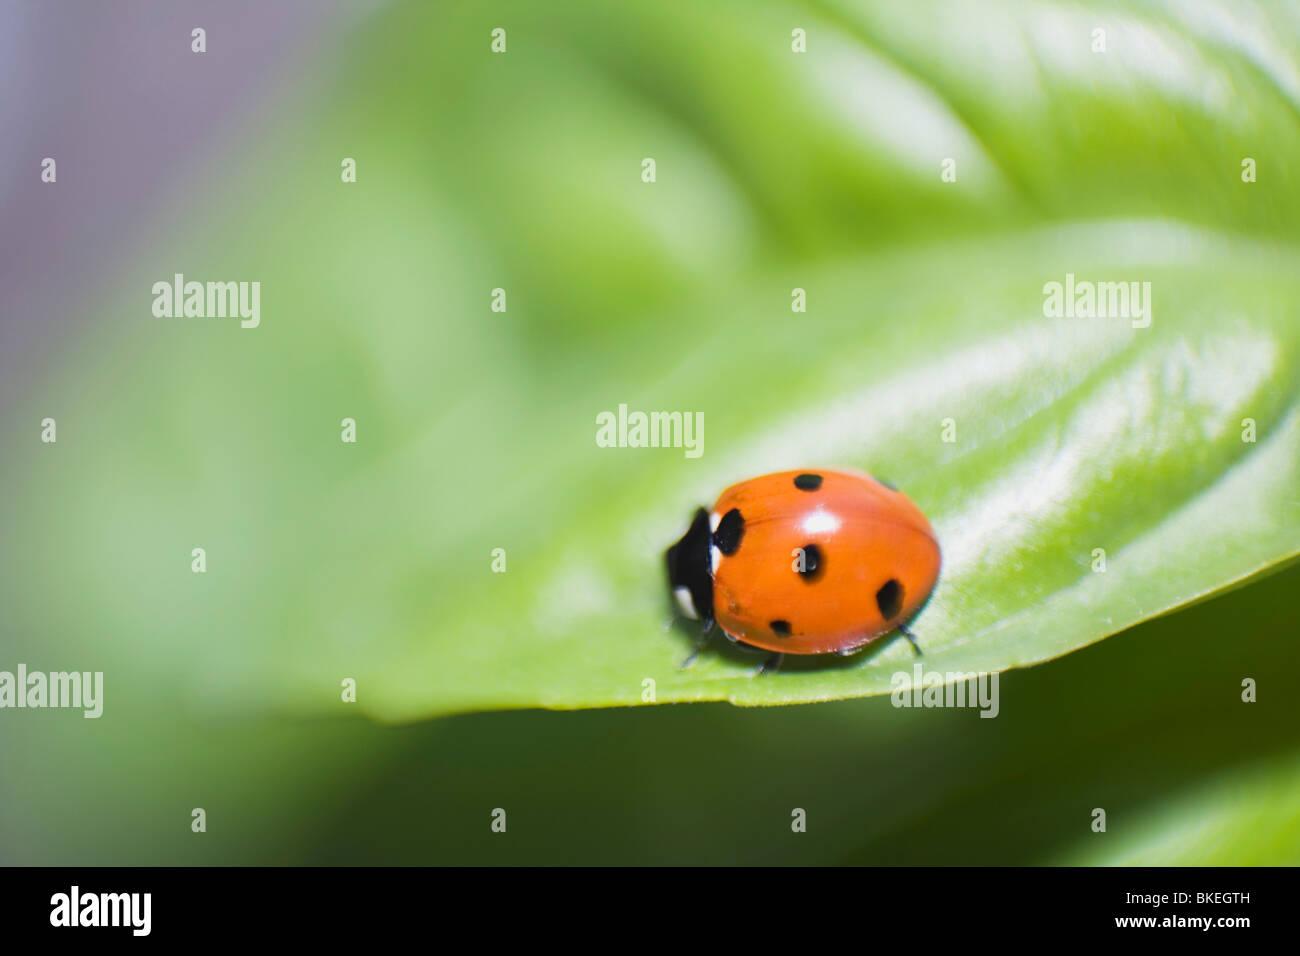 Ladybug On A Leaf - Stock Image